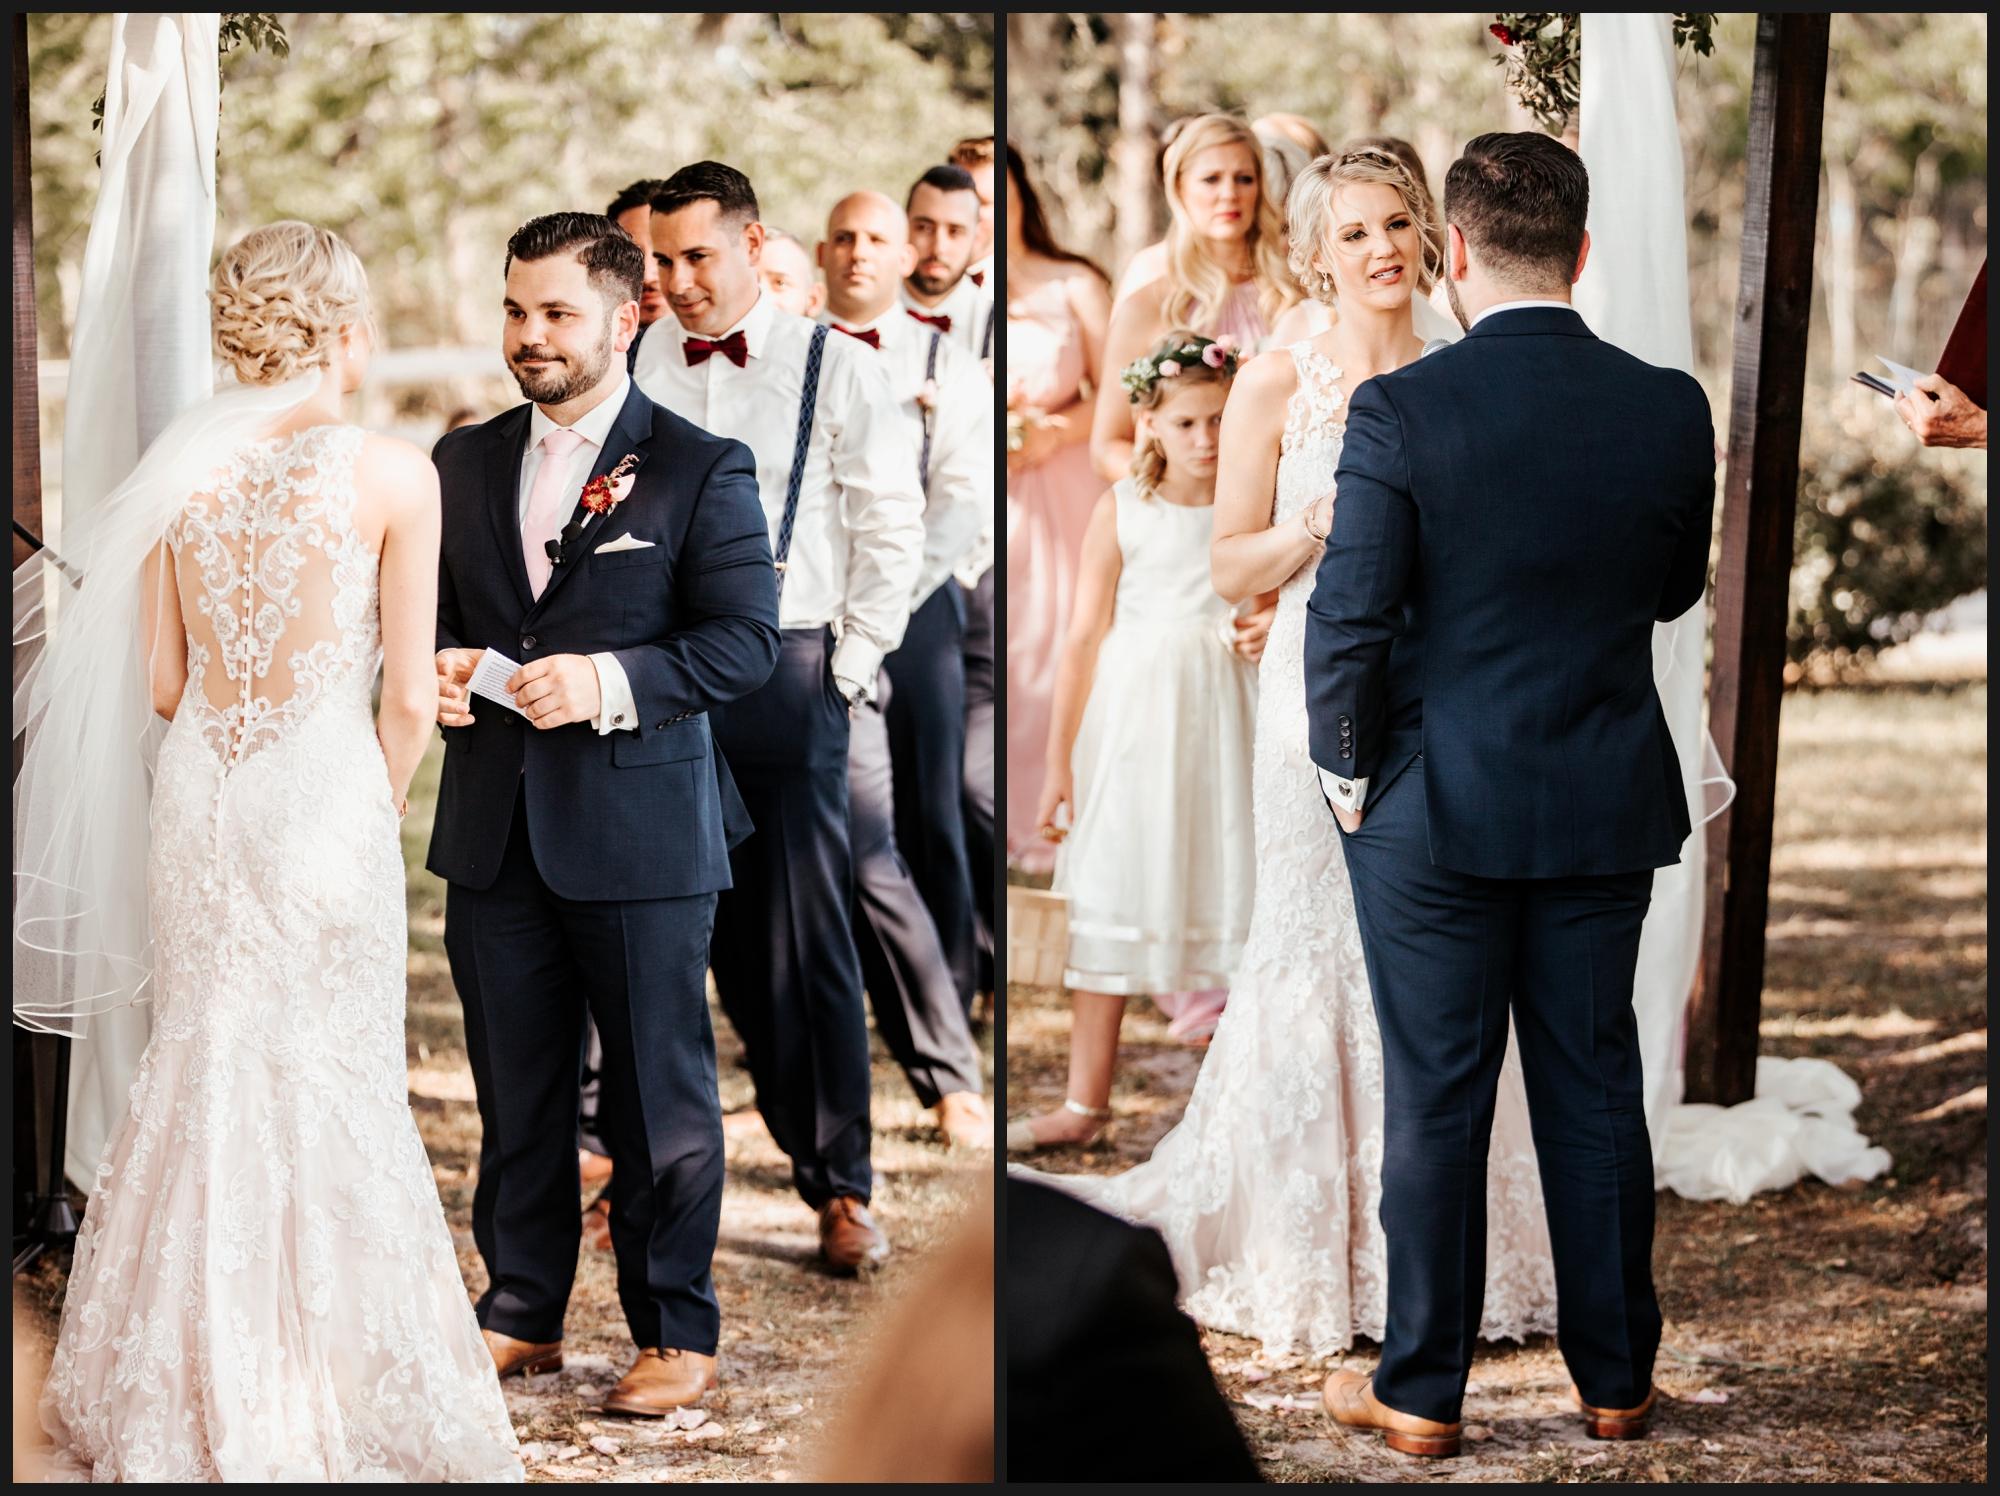 Orlando-Wedding-Photographer-destination-wedding-photographer-florida-wedding-photographer-hawaii-wedding-photographer_0554.jpg